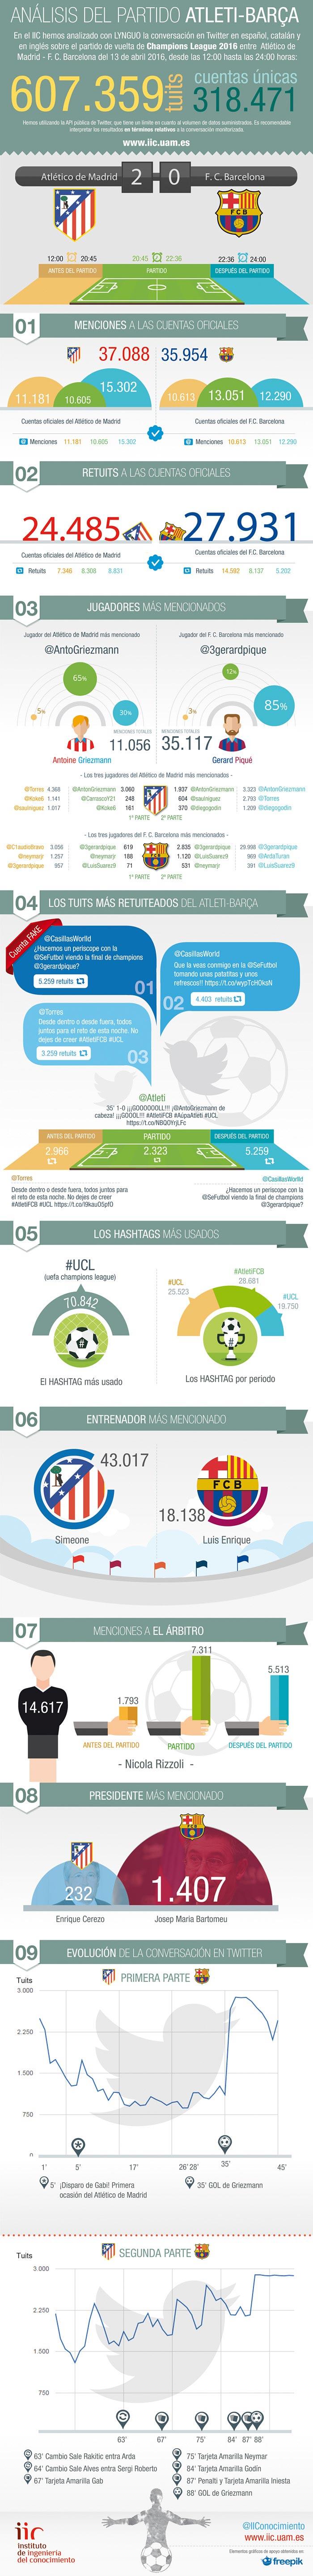 Infografía Atleti-Barsa